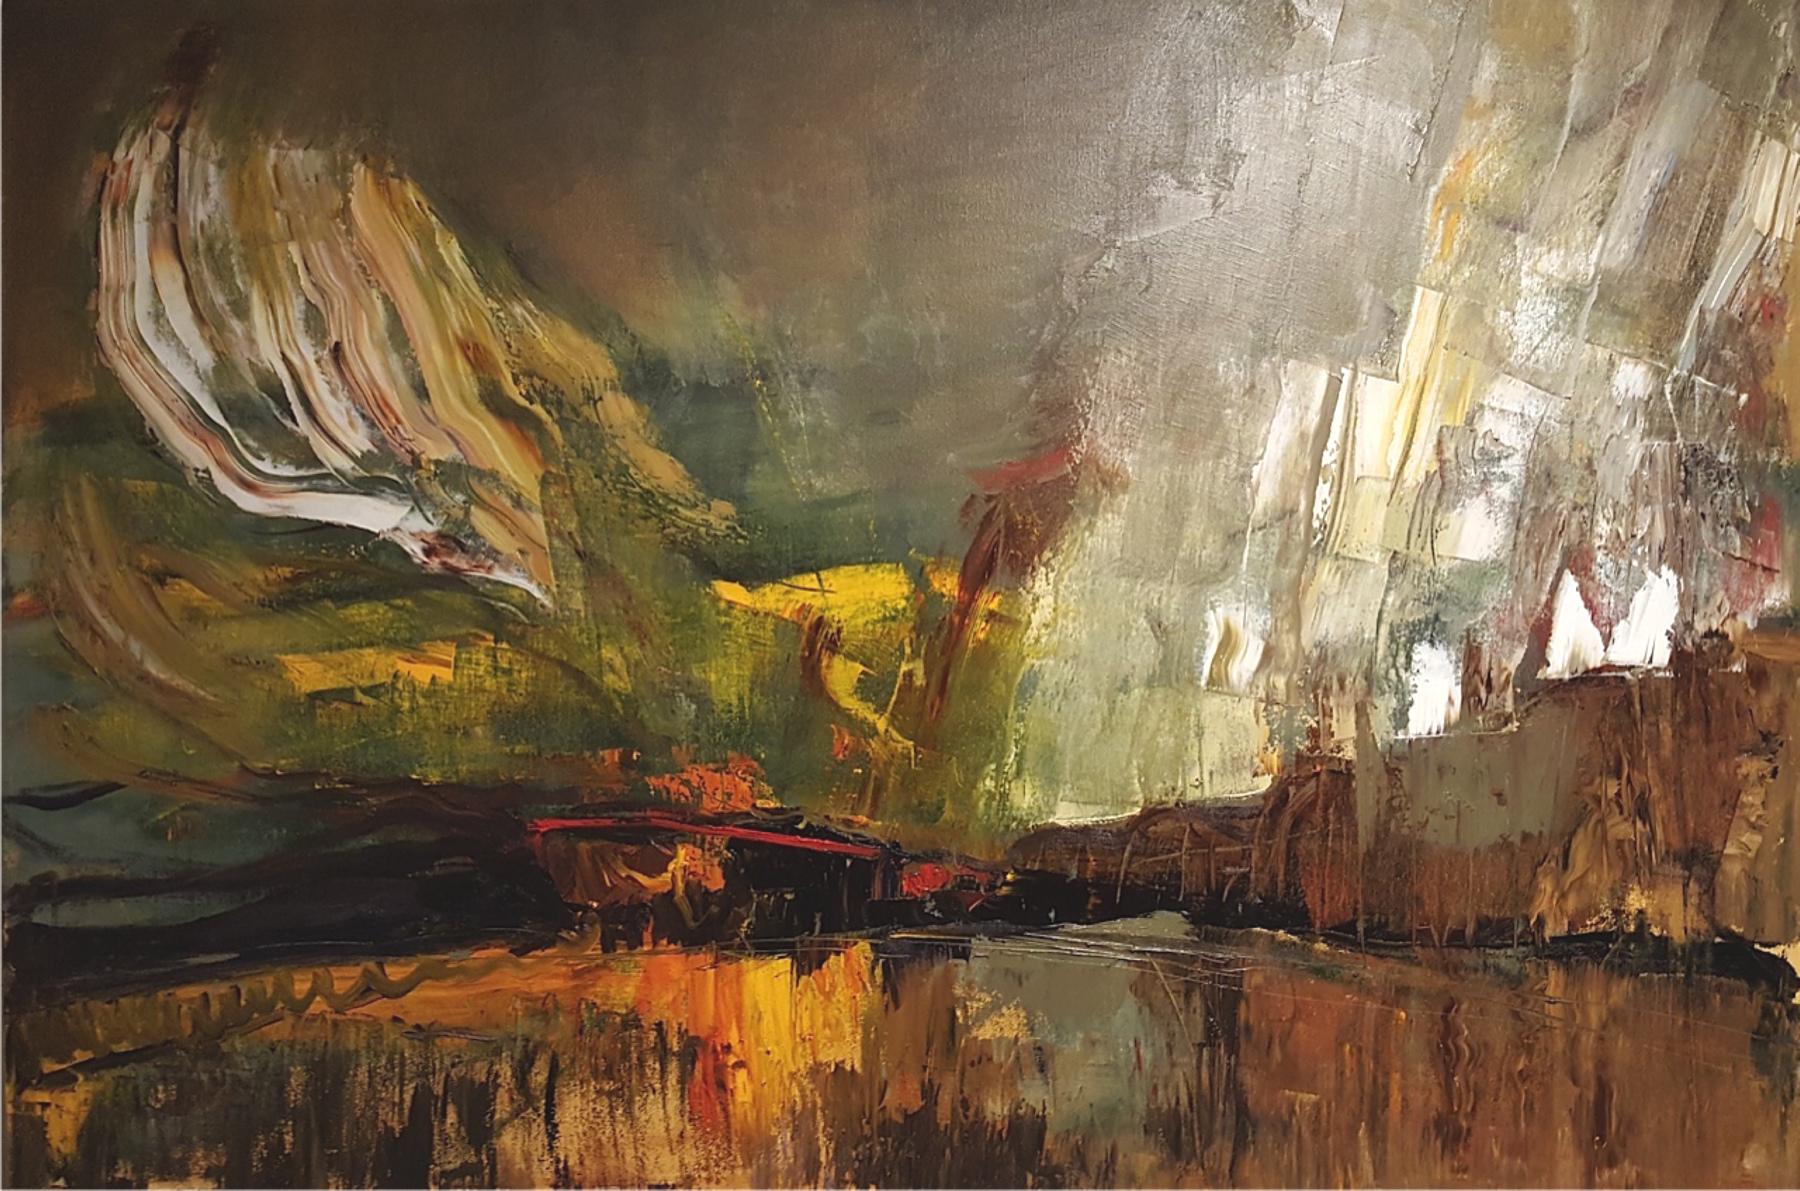 "LJ-033,Rise,2016,Oil on Canvas,24"" x 36"""